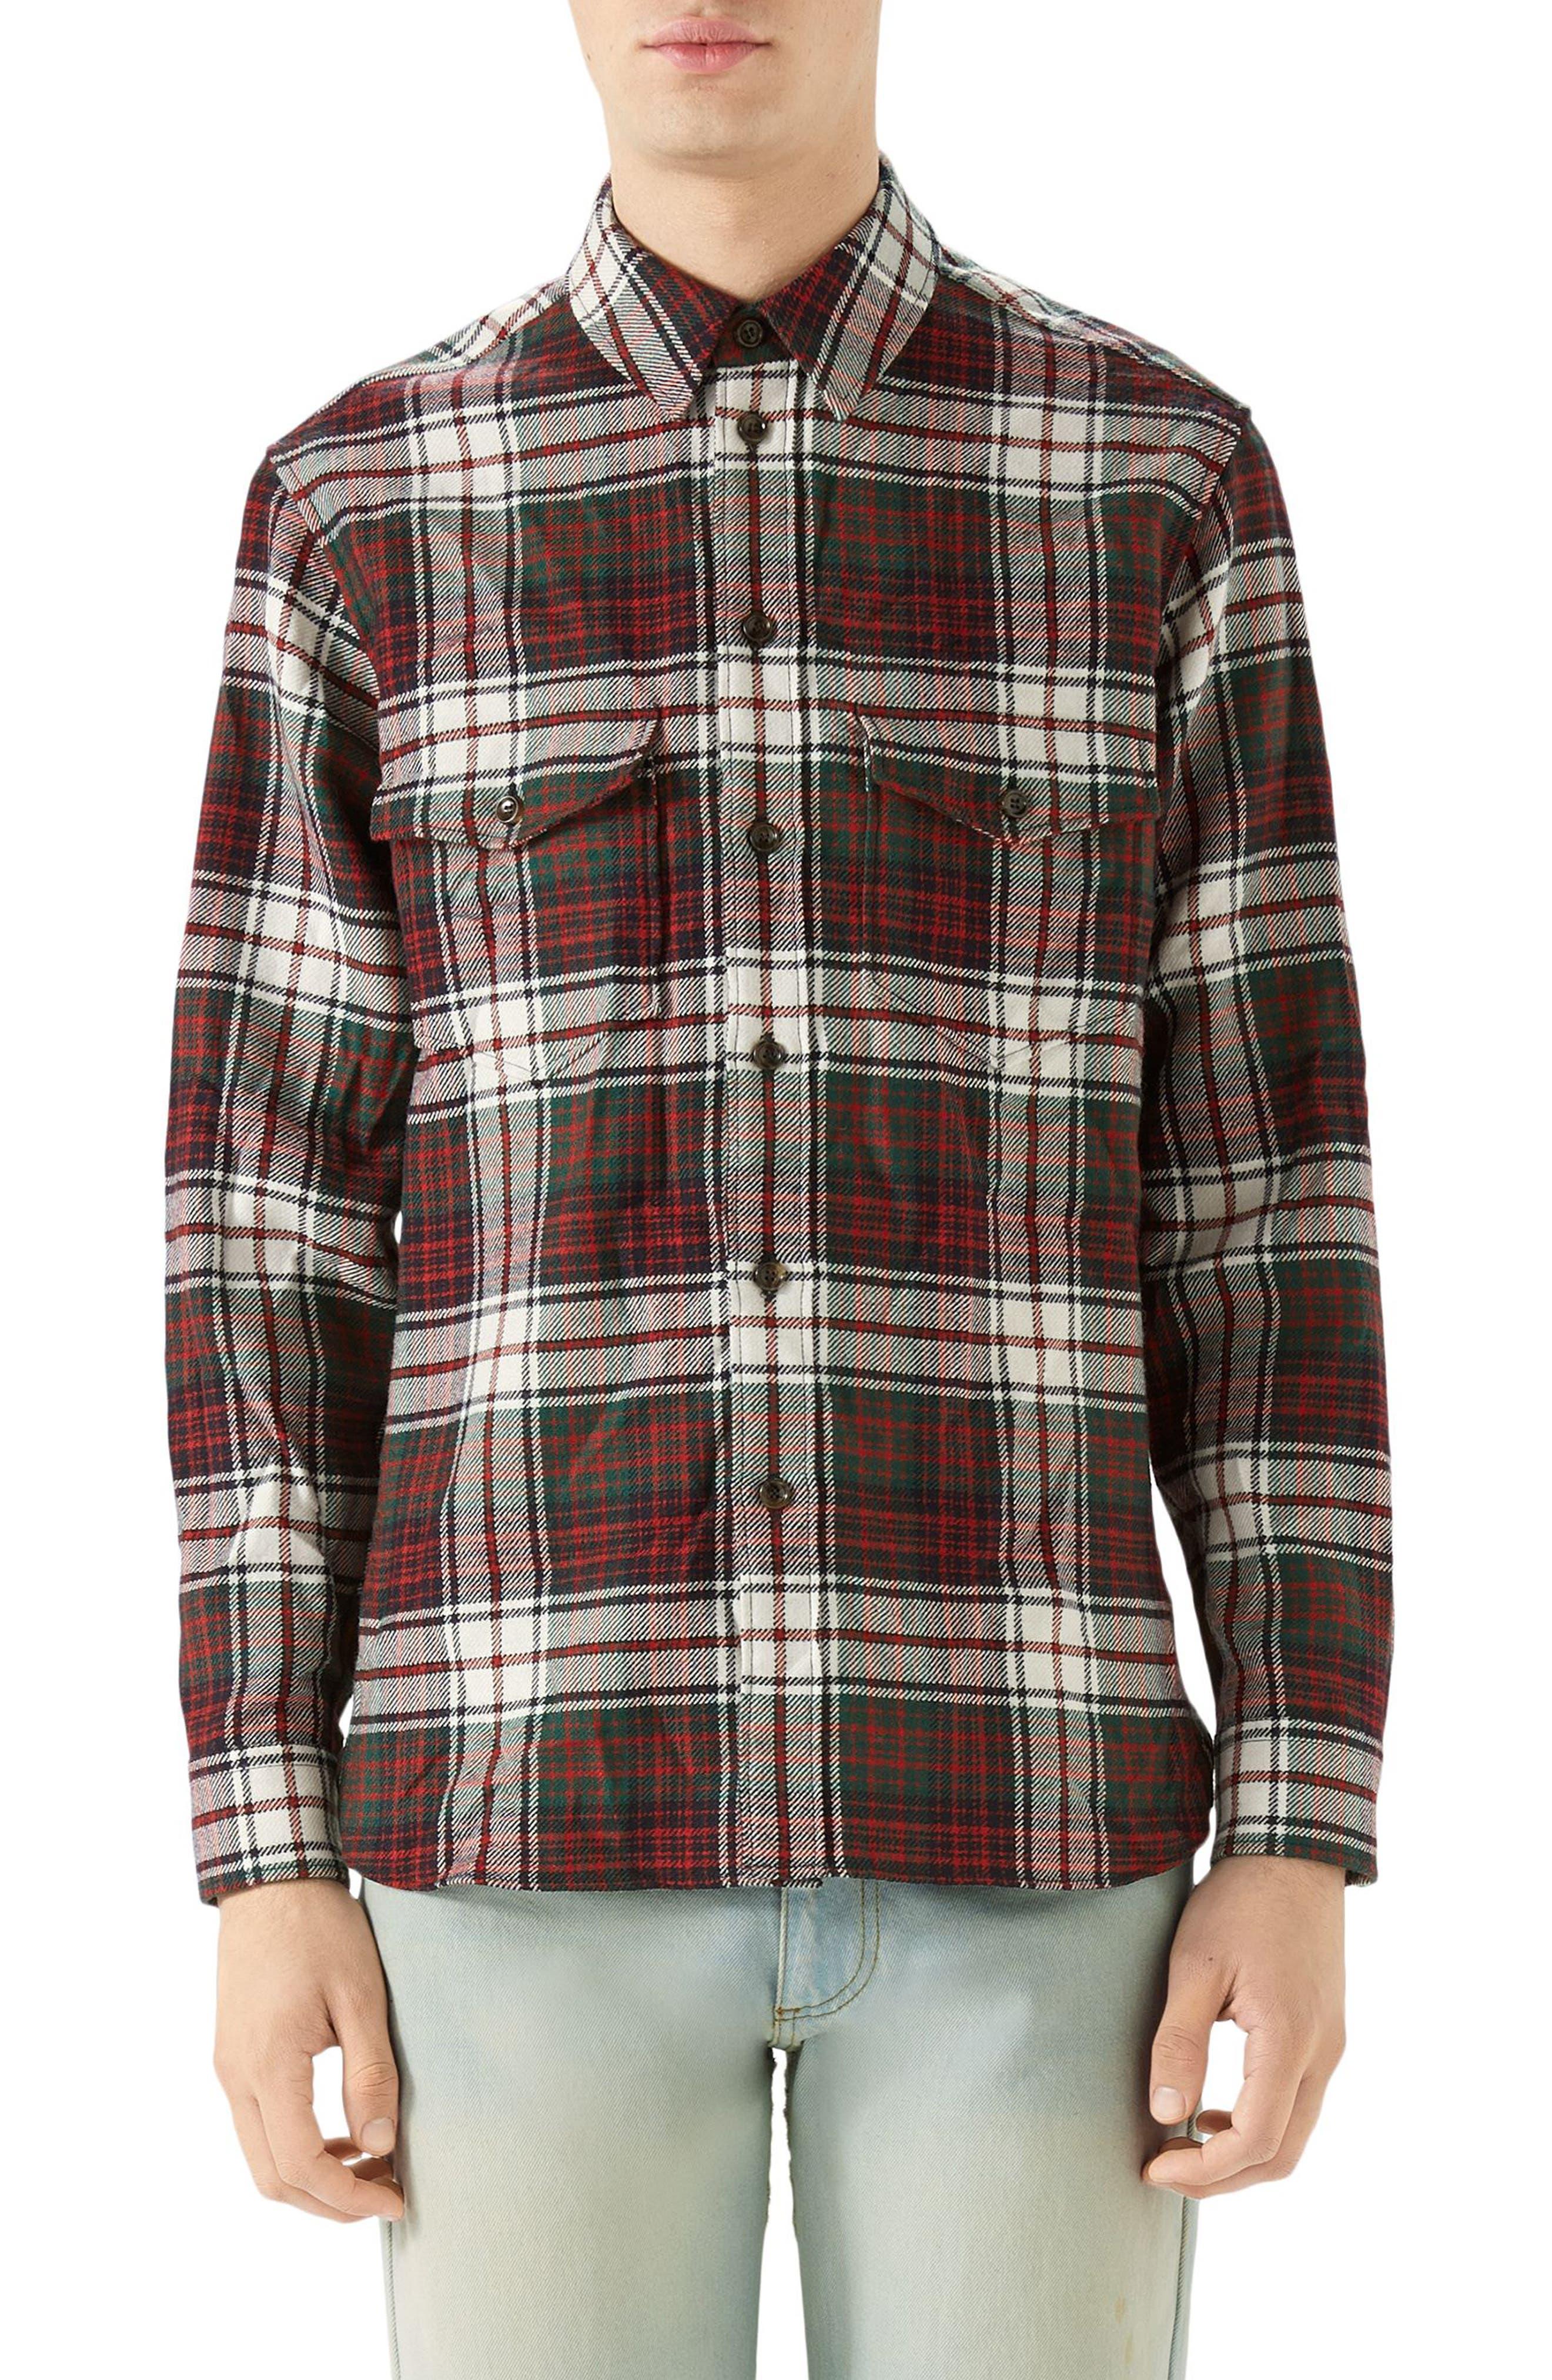 GUCCI, Vintage Tartan Check Wool Flannel Sport Shirt, Main thumbnail 1, color, RED